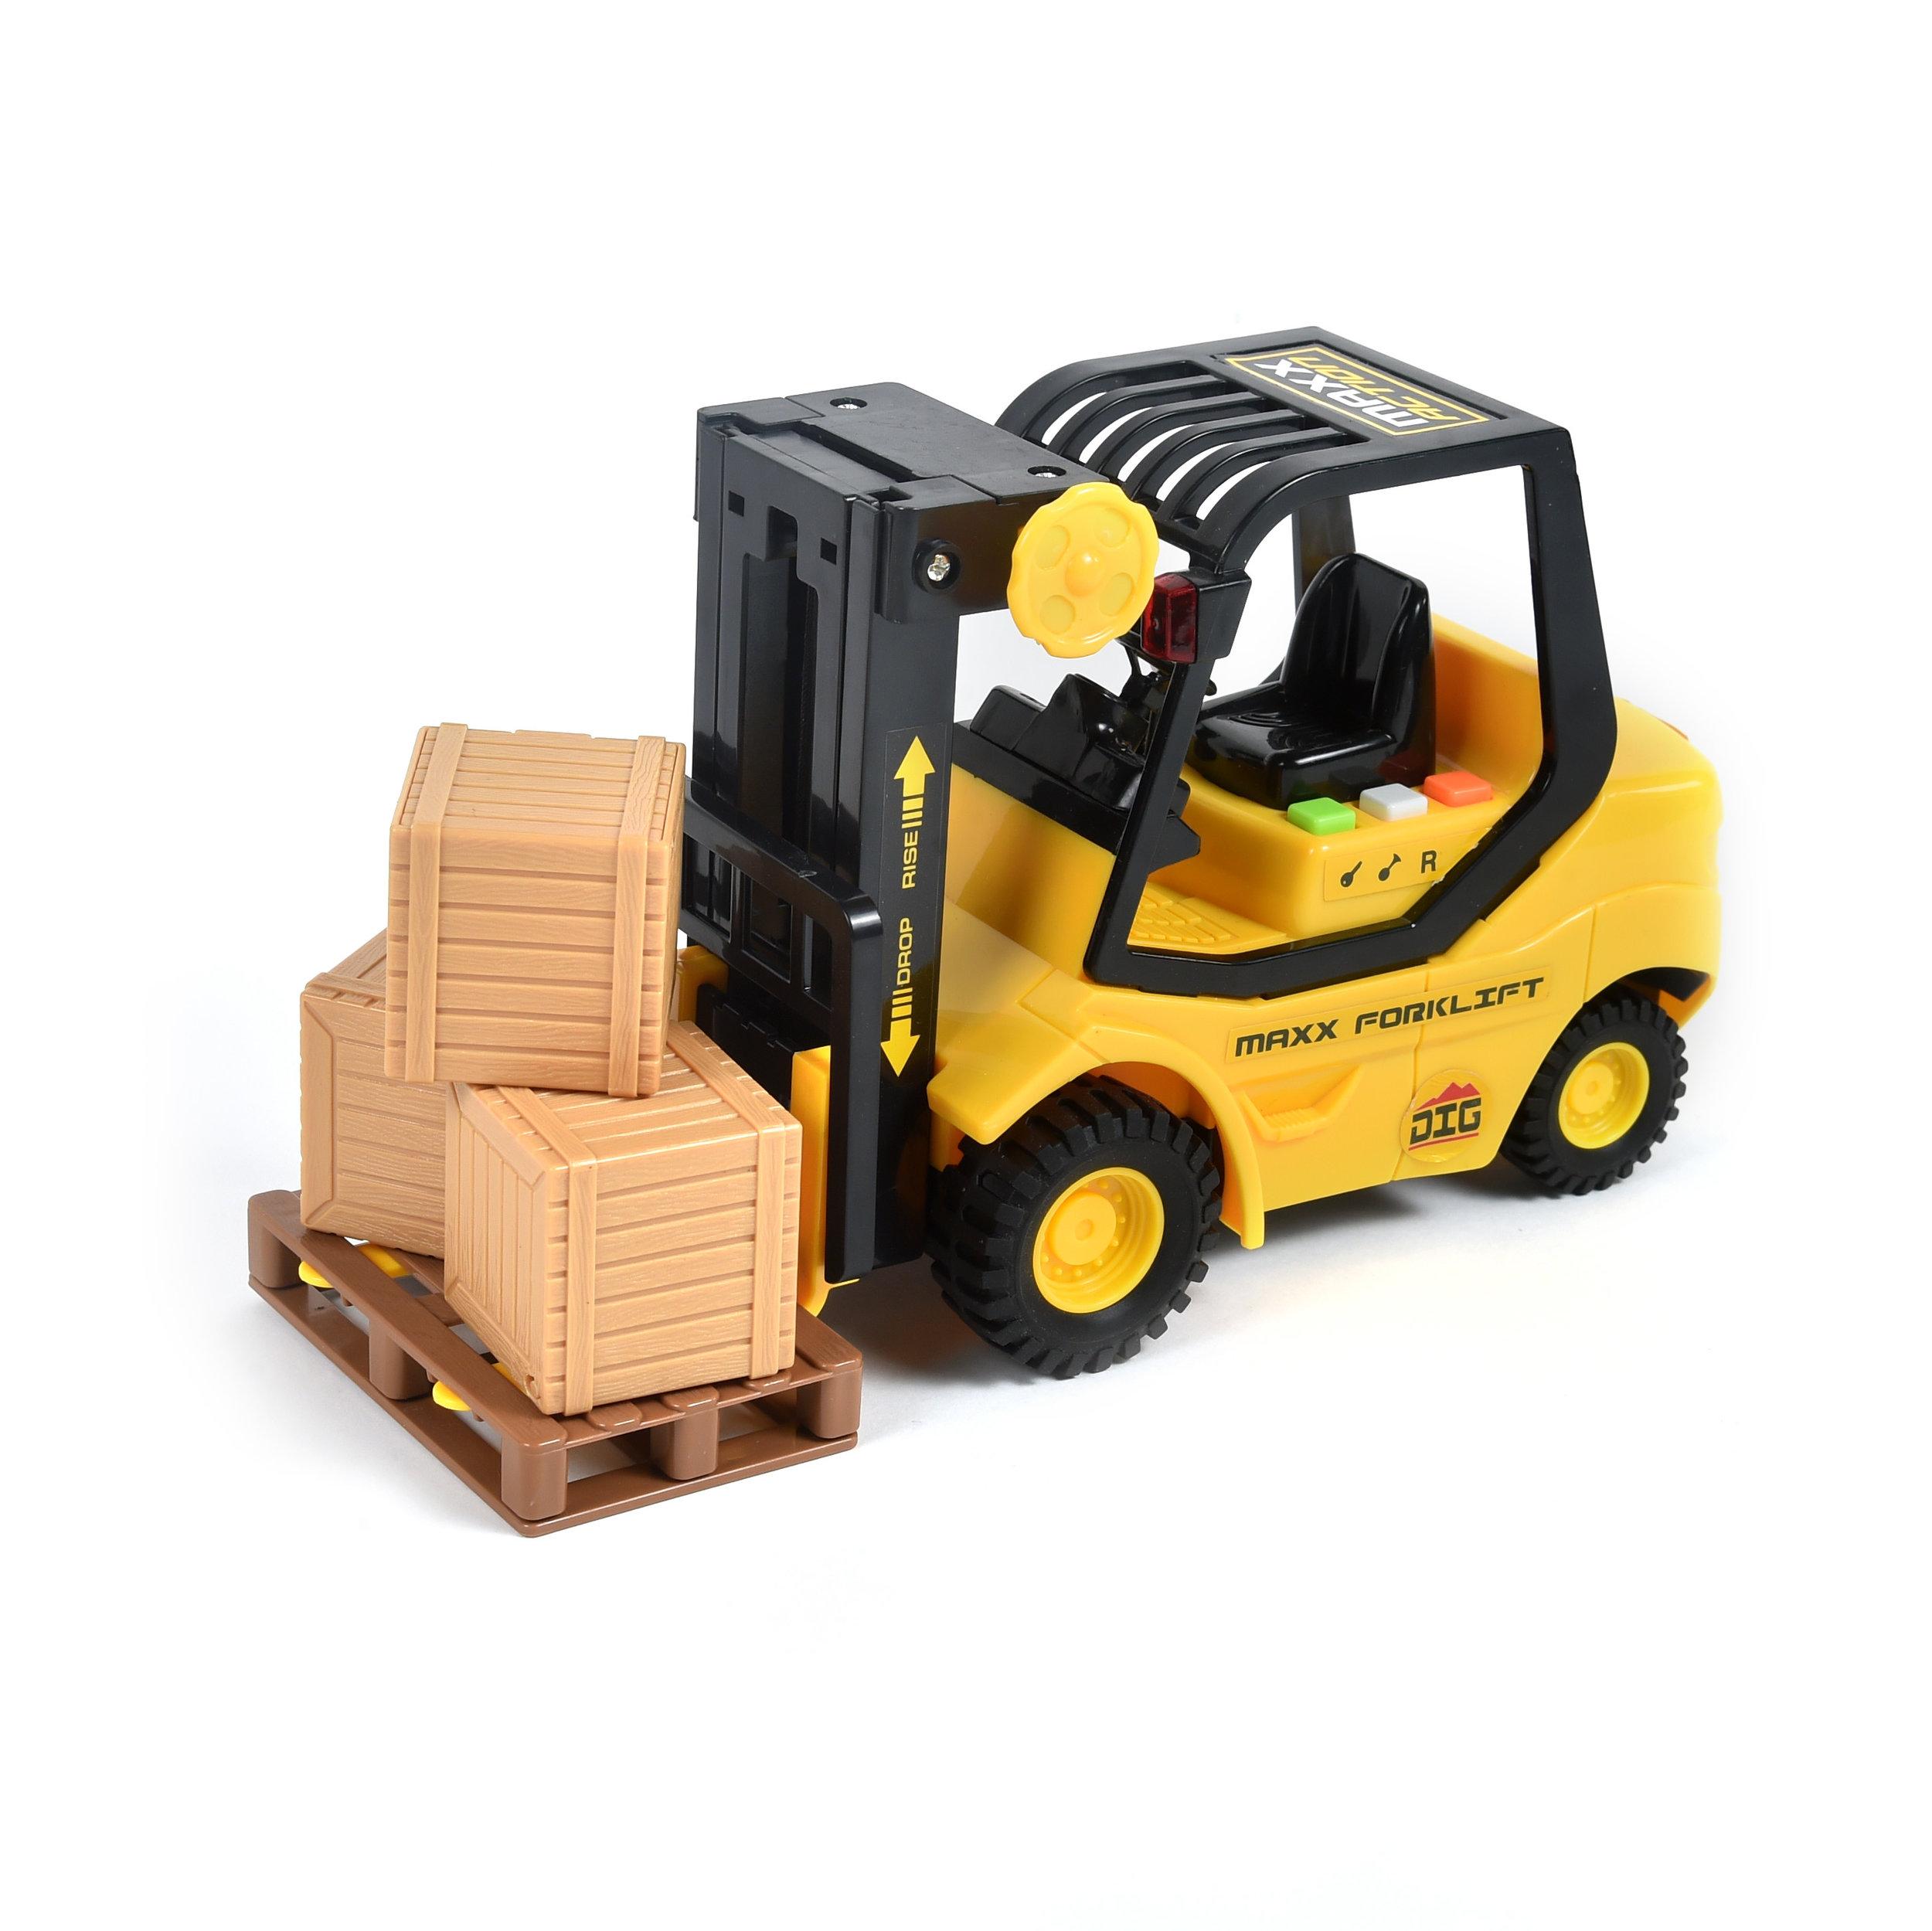 1:16 Construction Vehicle - Forklift